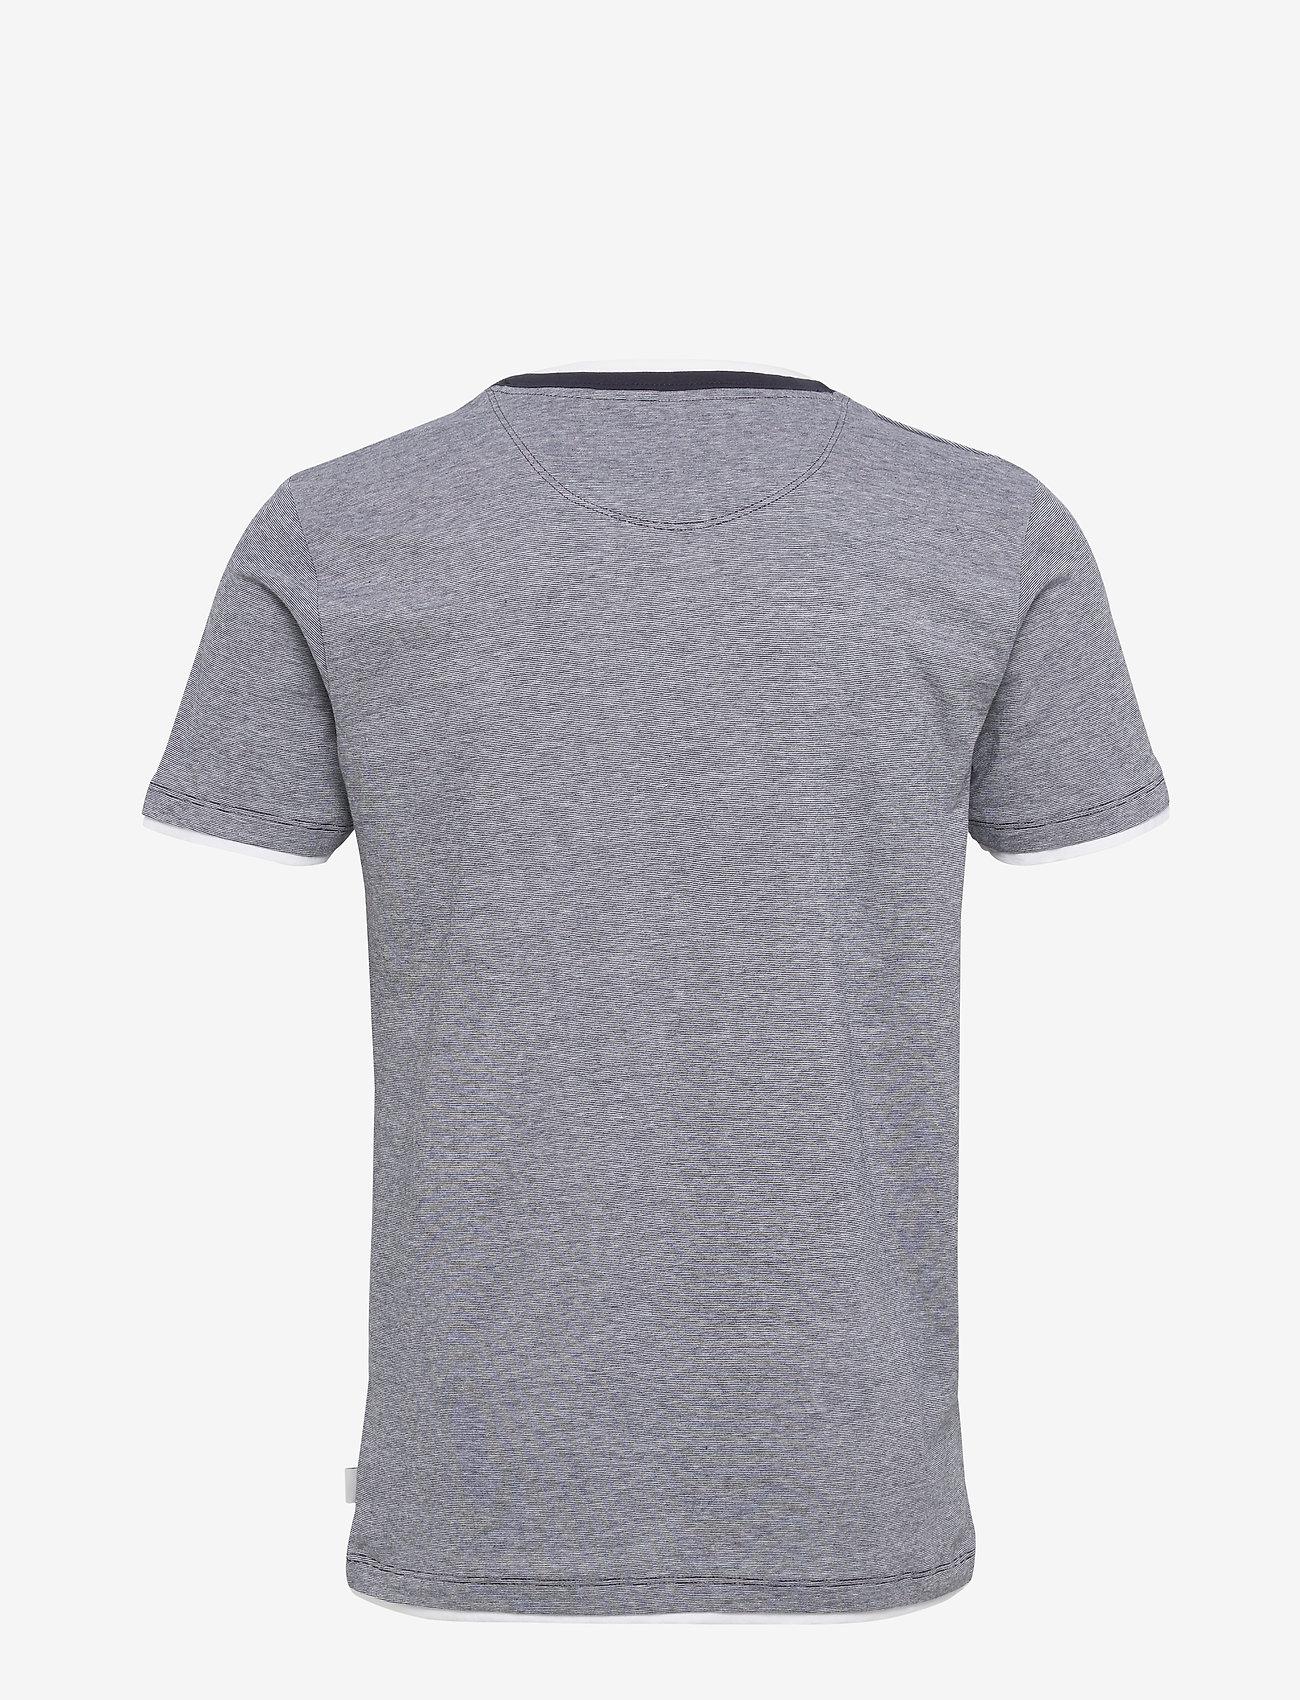 Esprit Casual - T-Shirts - t-shirts basiques - navy 3 - 1